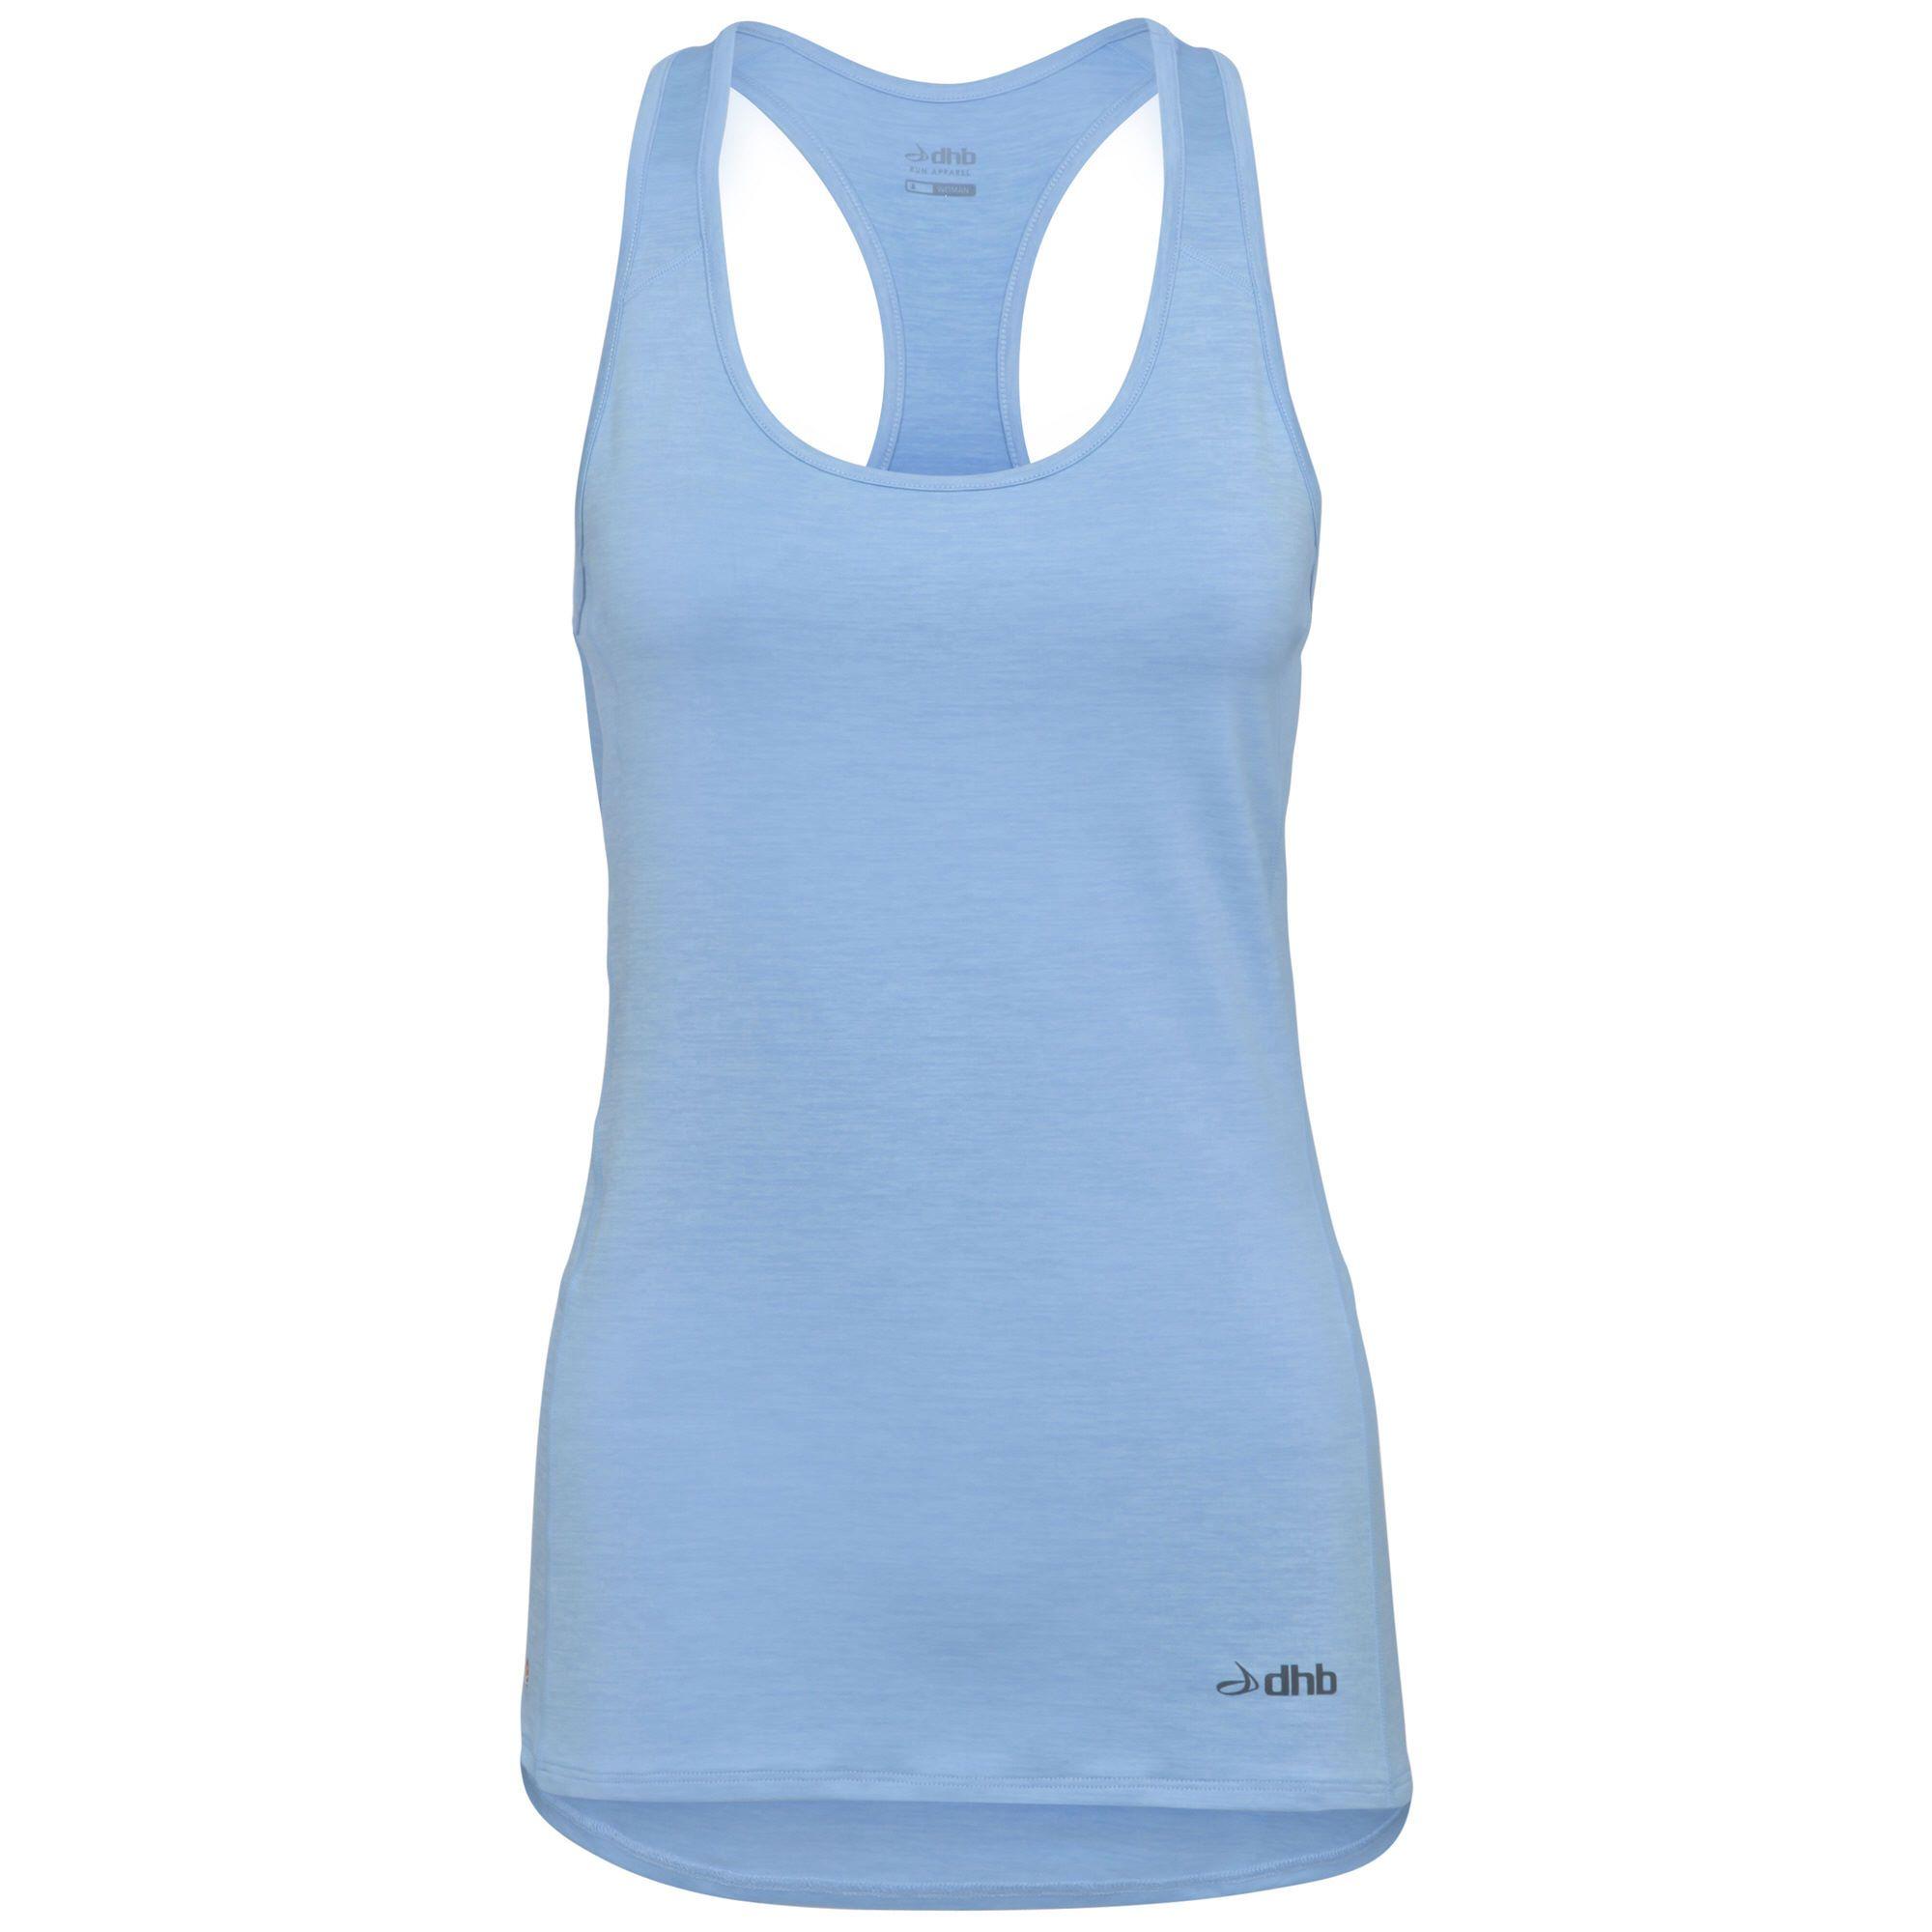 145518cf8 Affordable running gear: Women's kit that won't break the bank